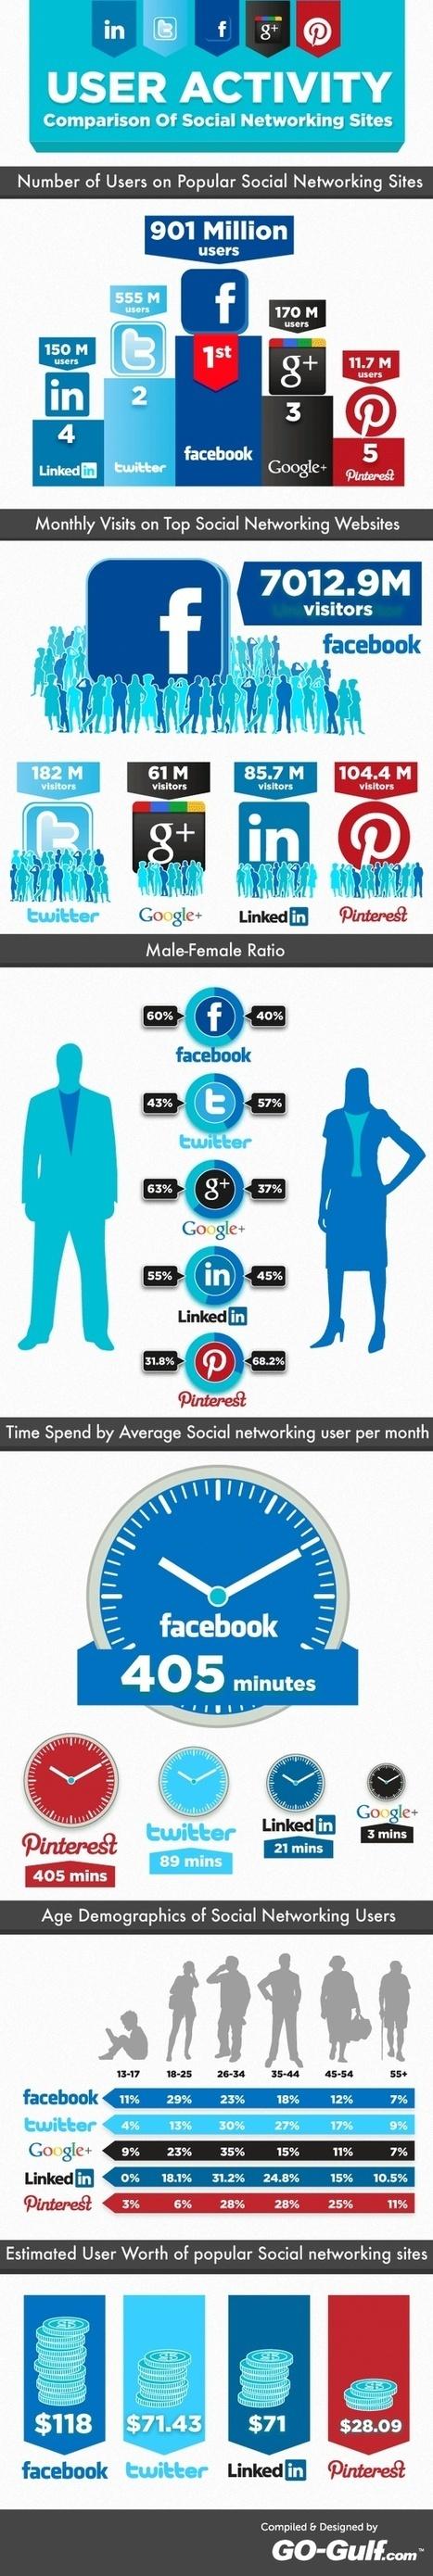 Mest3 Impact of New & Digital Media | App industry | Scoop.it